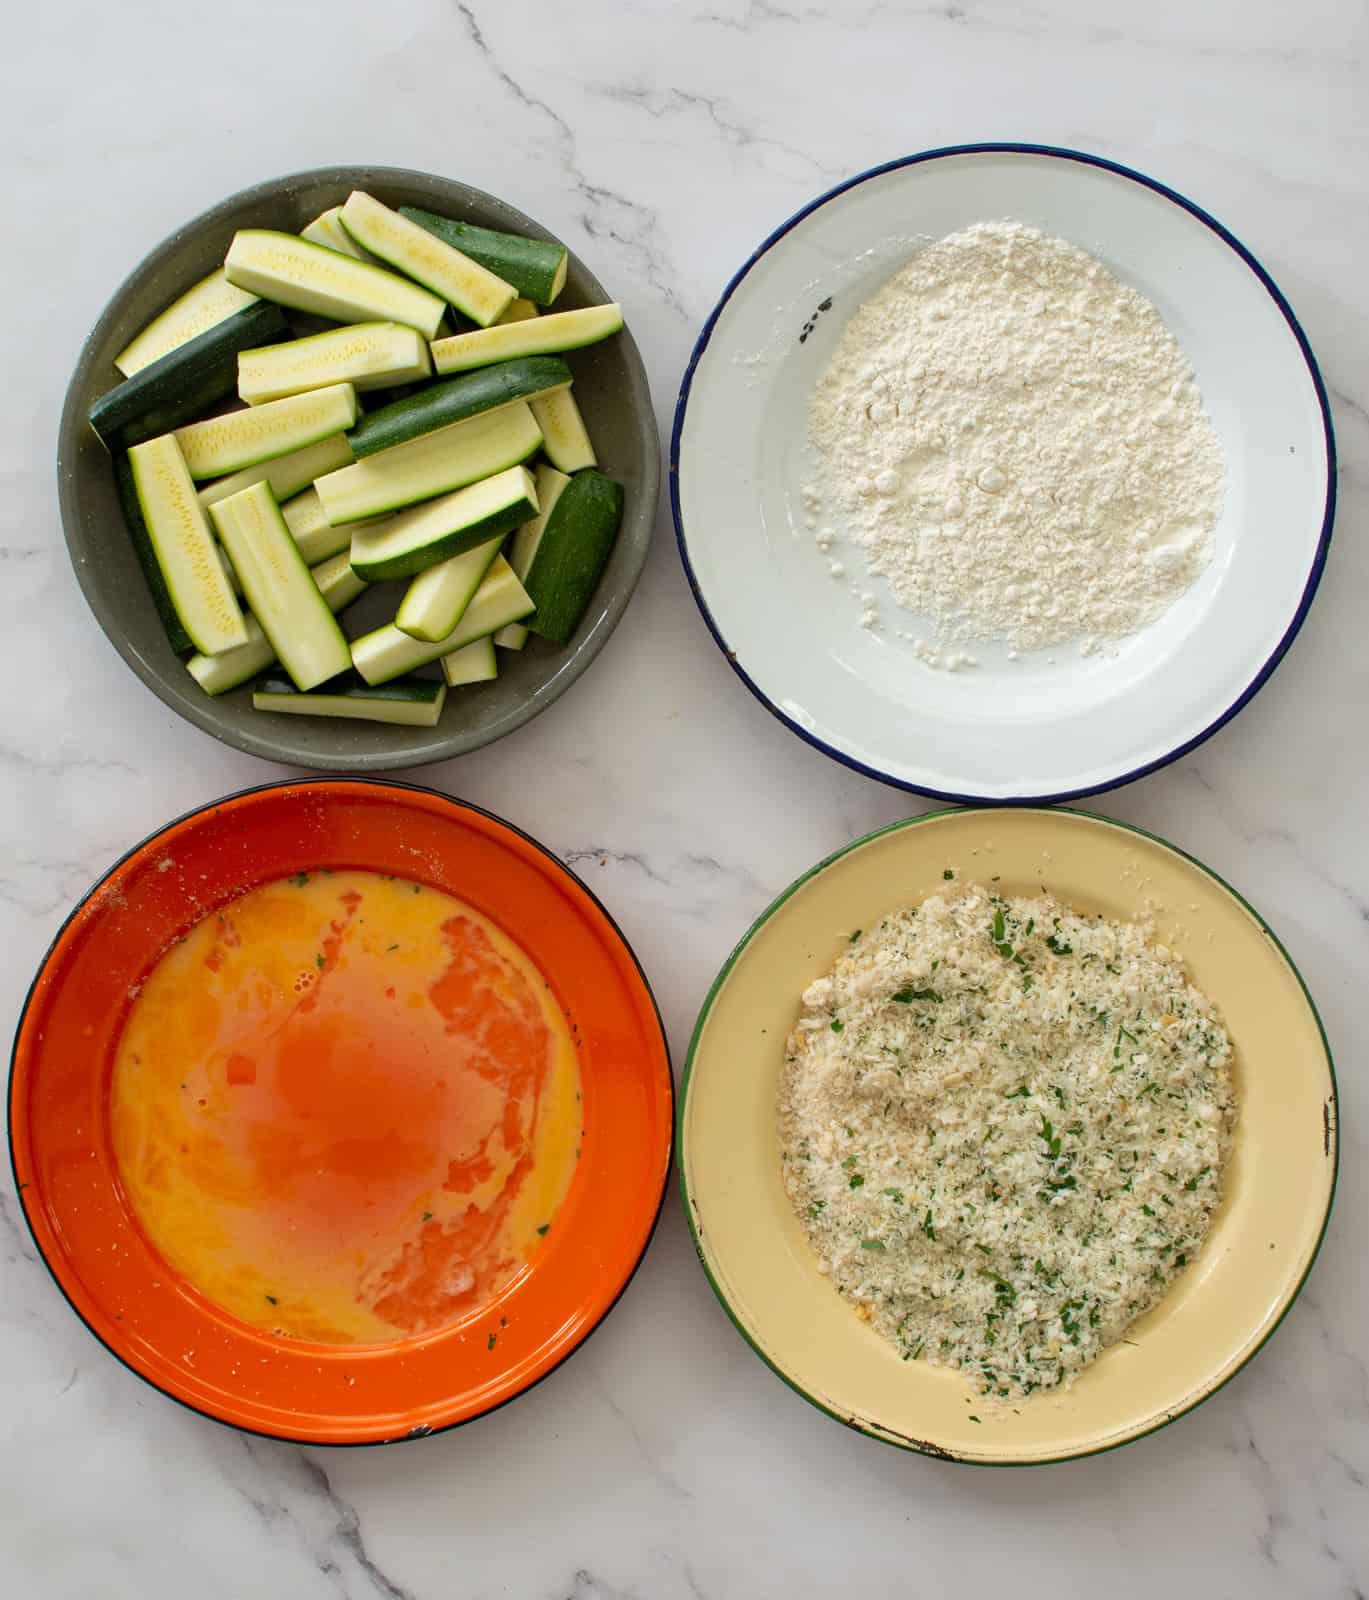 4 plates - zucchini, flour, eggs and breadcrumbs